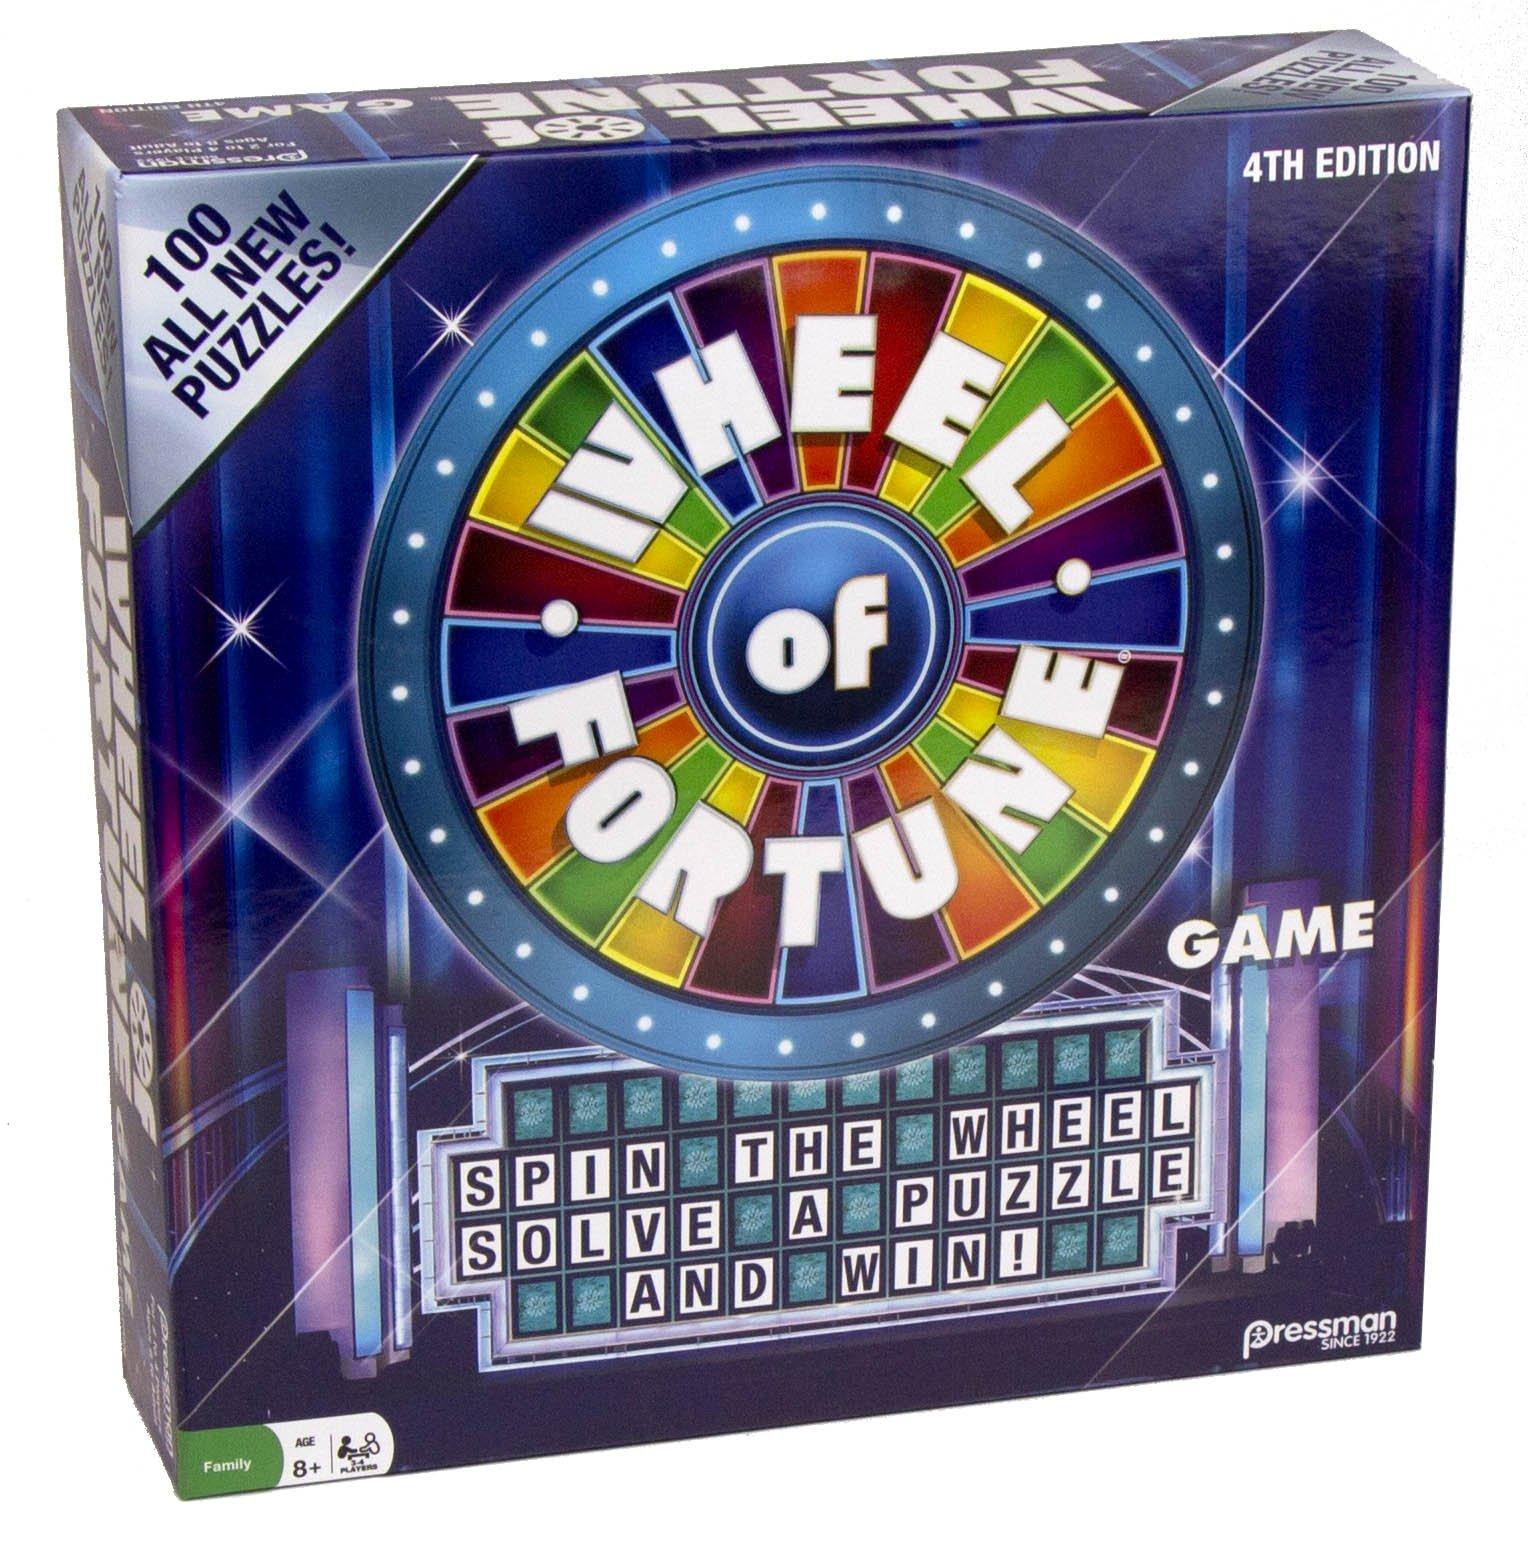 Pressman 4th Edition Wheel Of Fortune